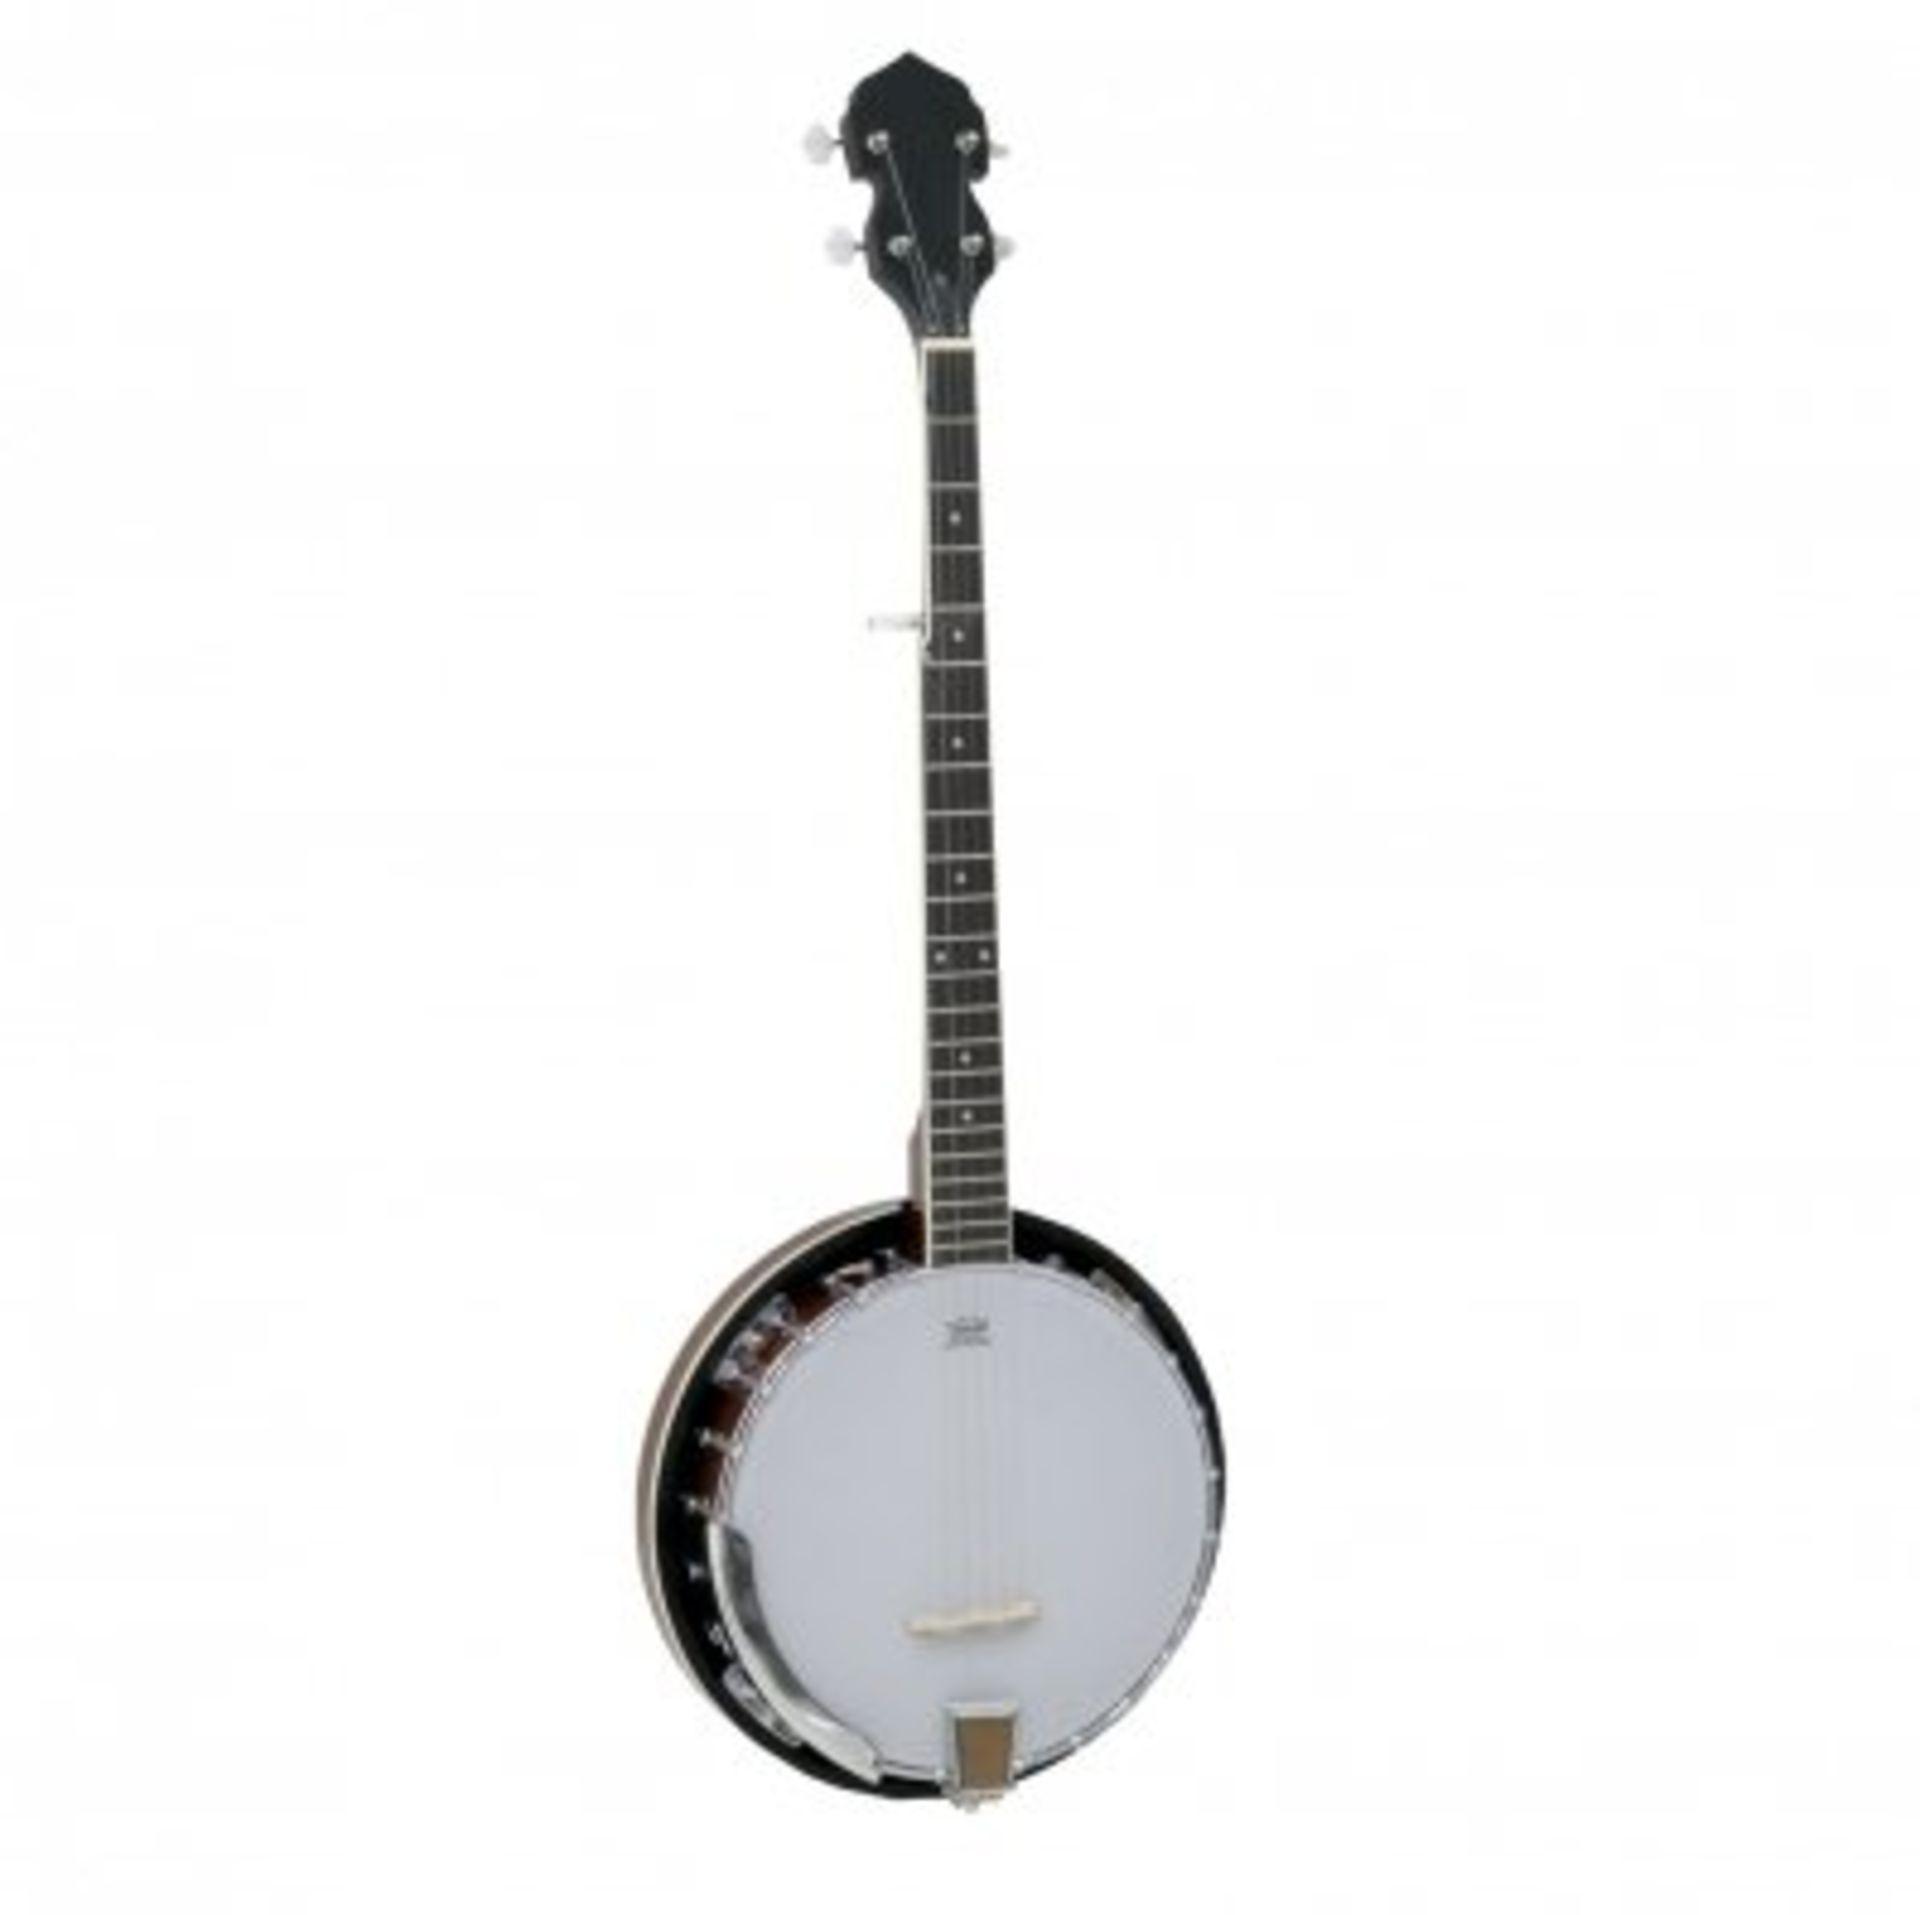 Lot 74 - (RU45) 5 String Bluegrass Banjo with Remo Skin The 5 string bluegrass banjo is great looking...